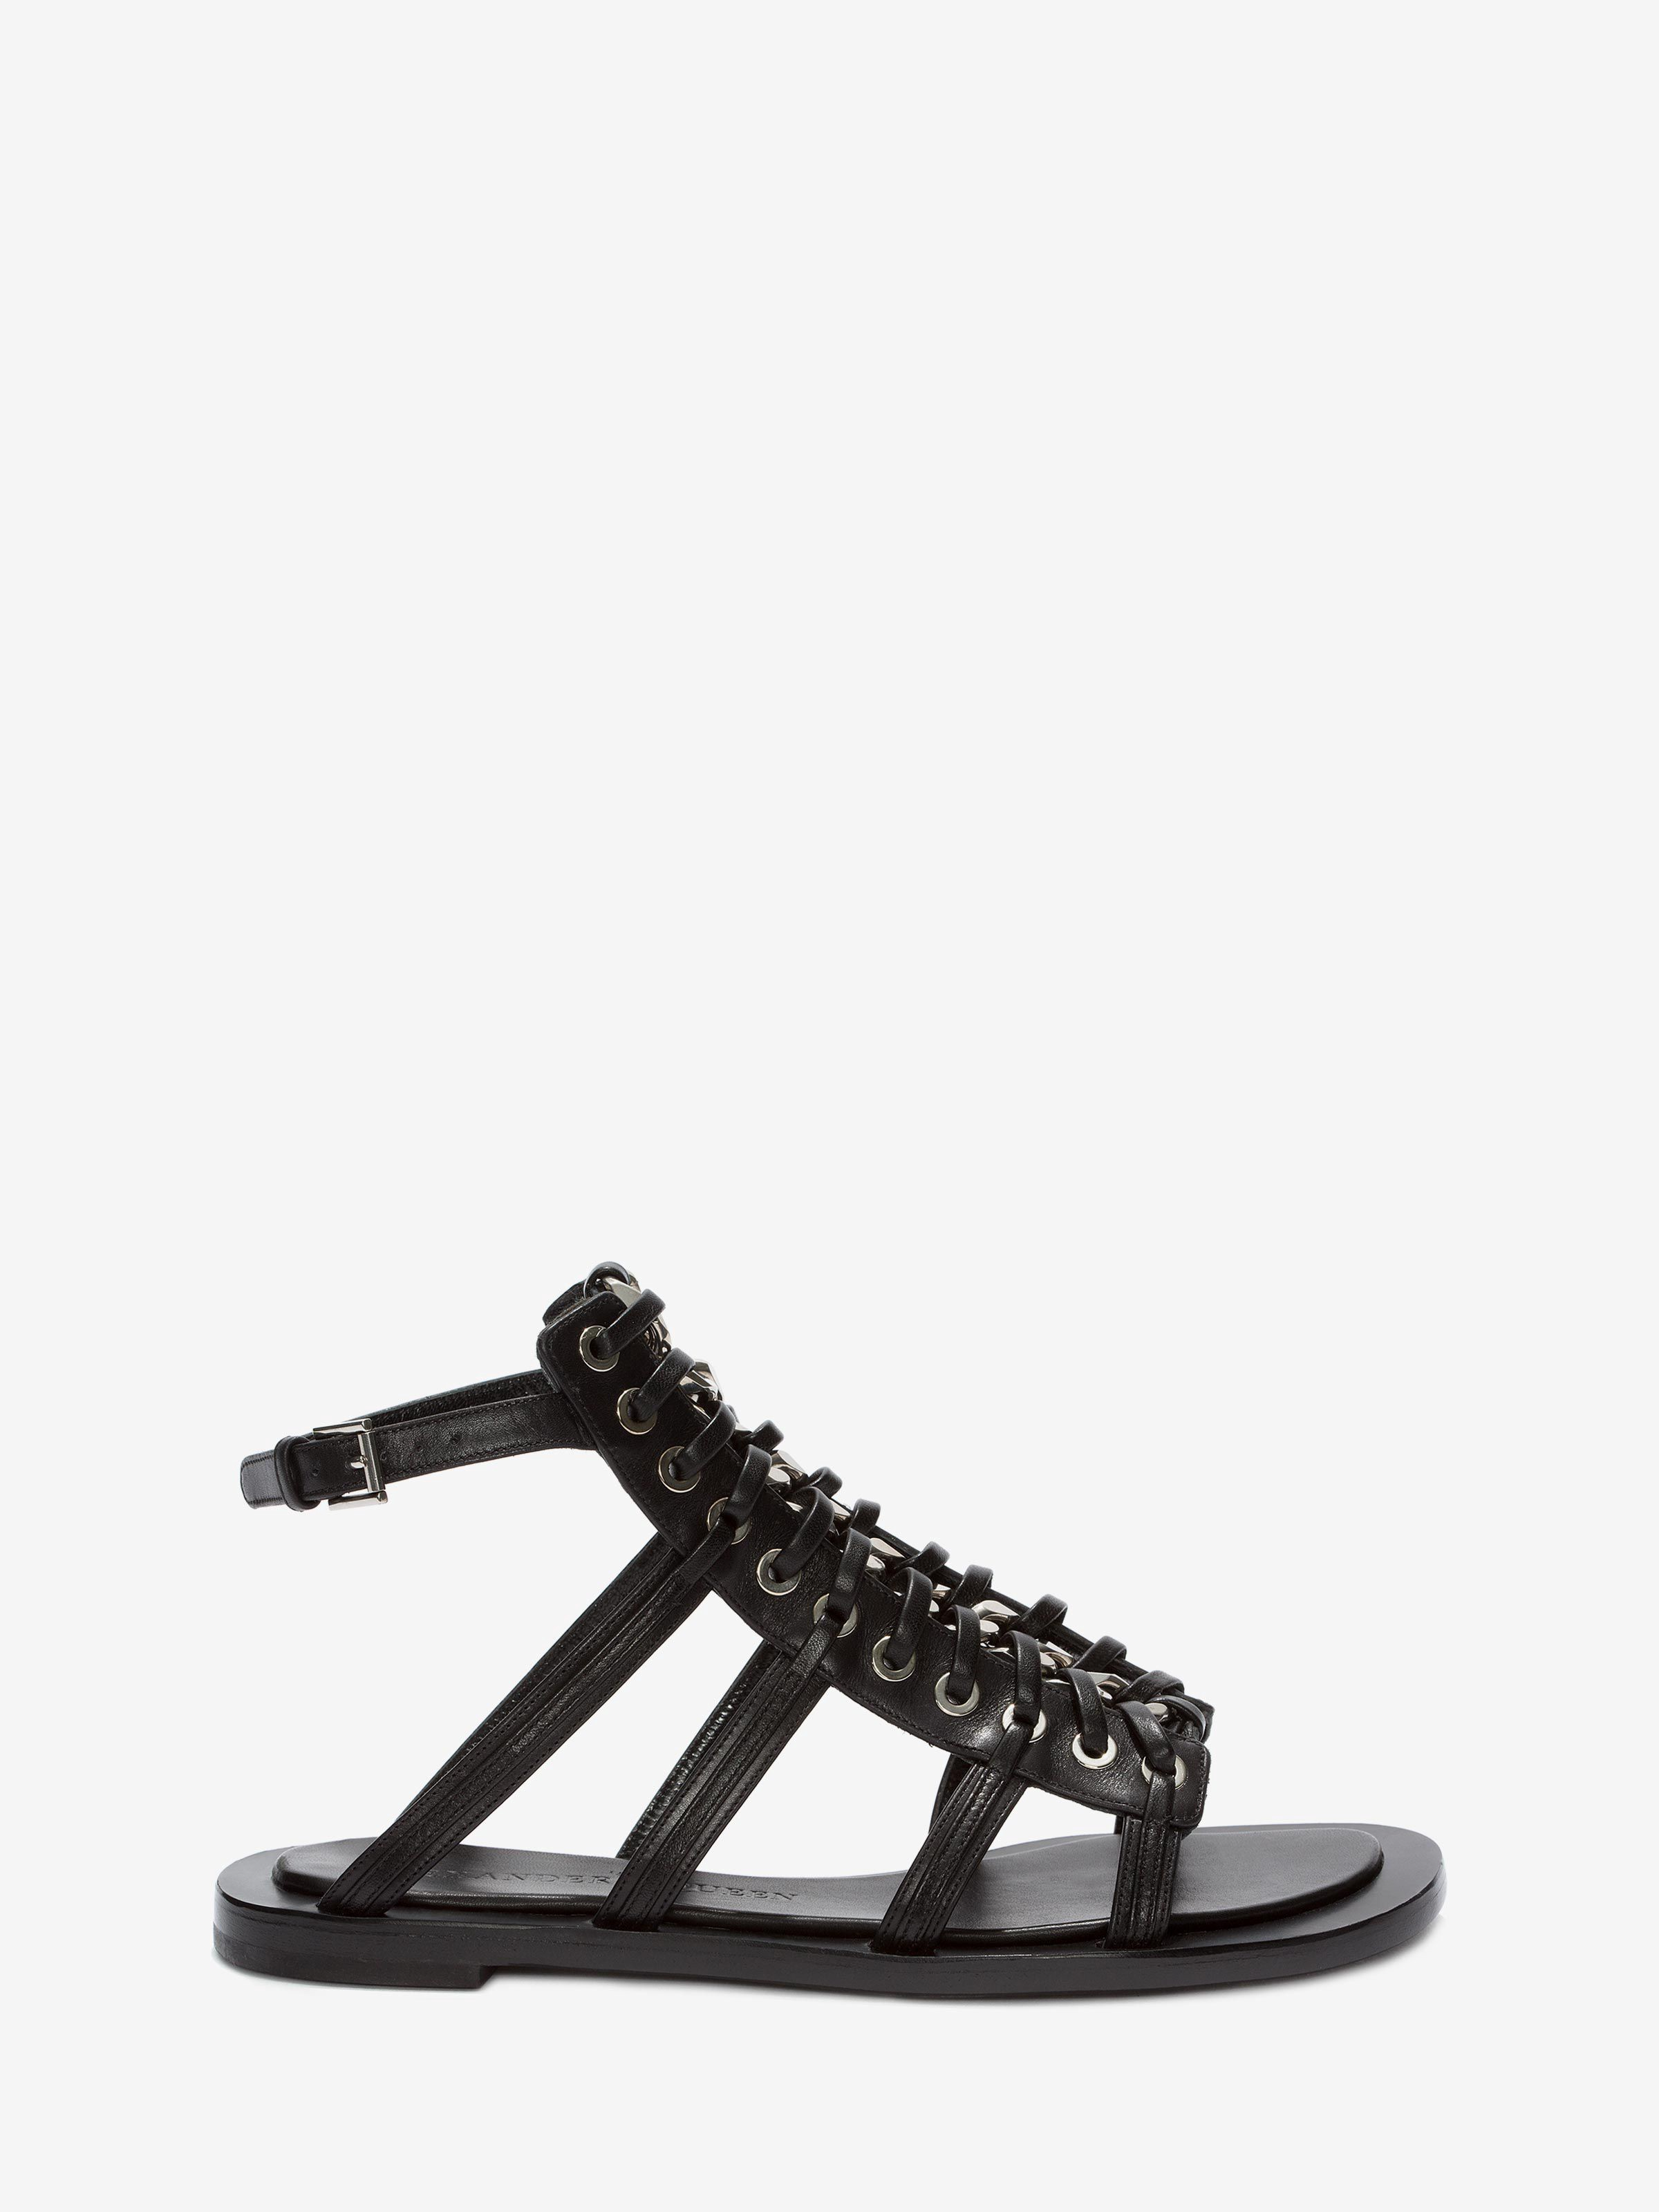 50f20480828c ALEXANDER MCQUEEN Braided Chain Sandal.  alexandermcqueen  shoes ...